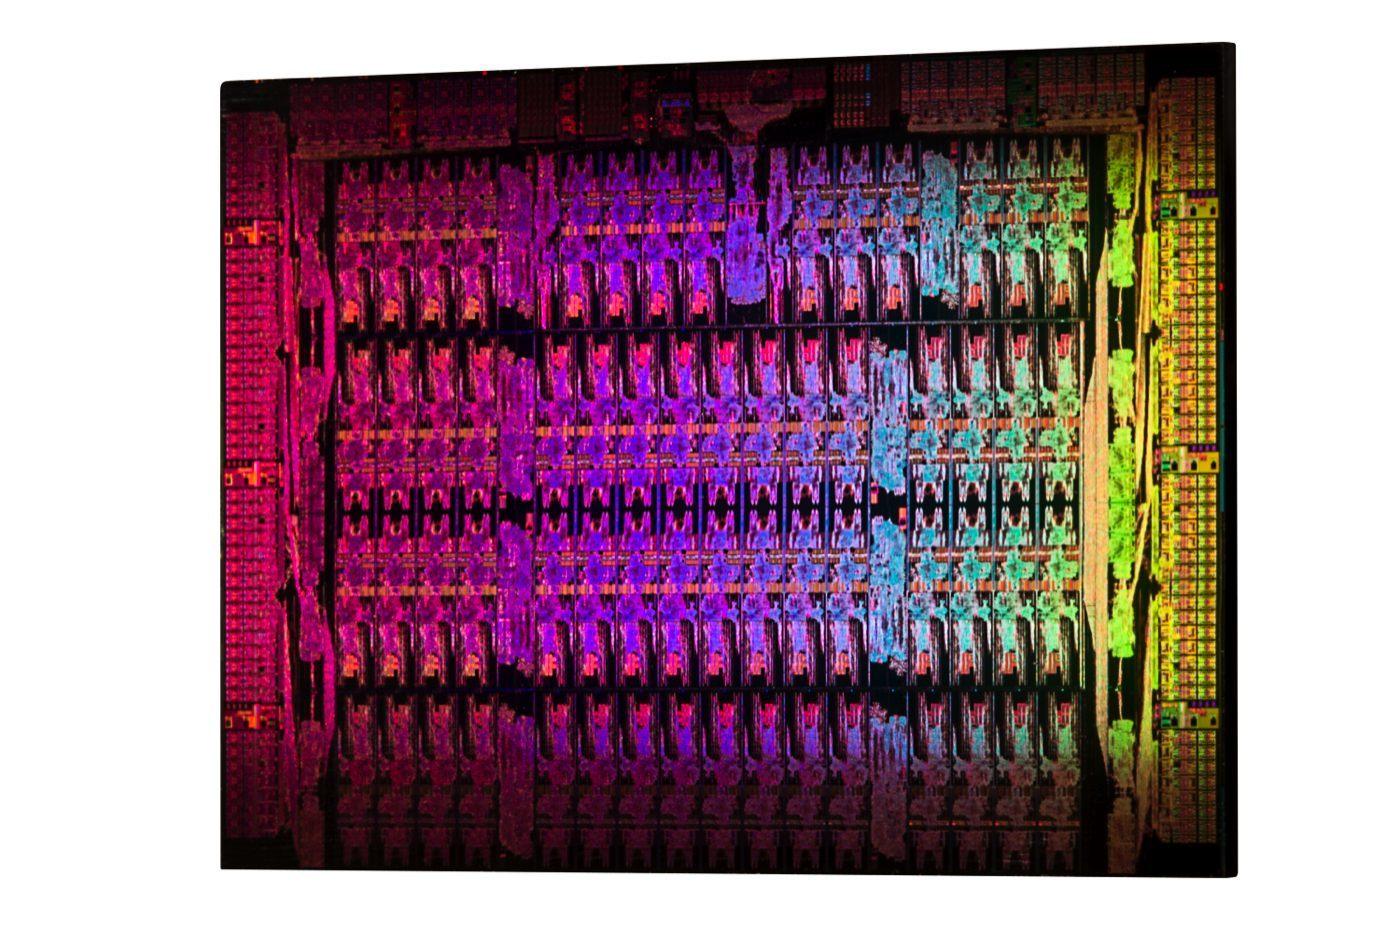 Foto de Intel Xeon Phi (7/9)